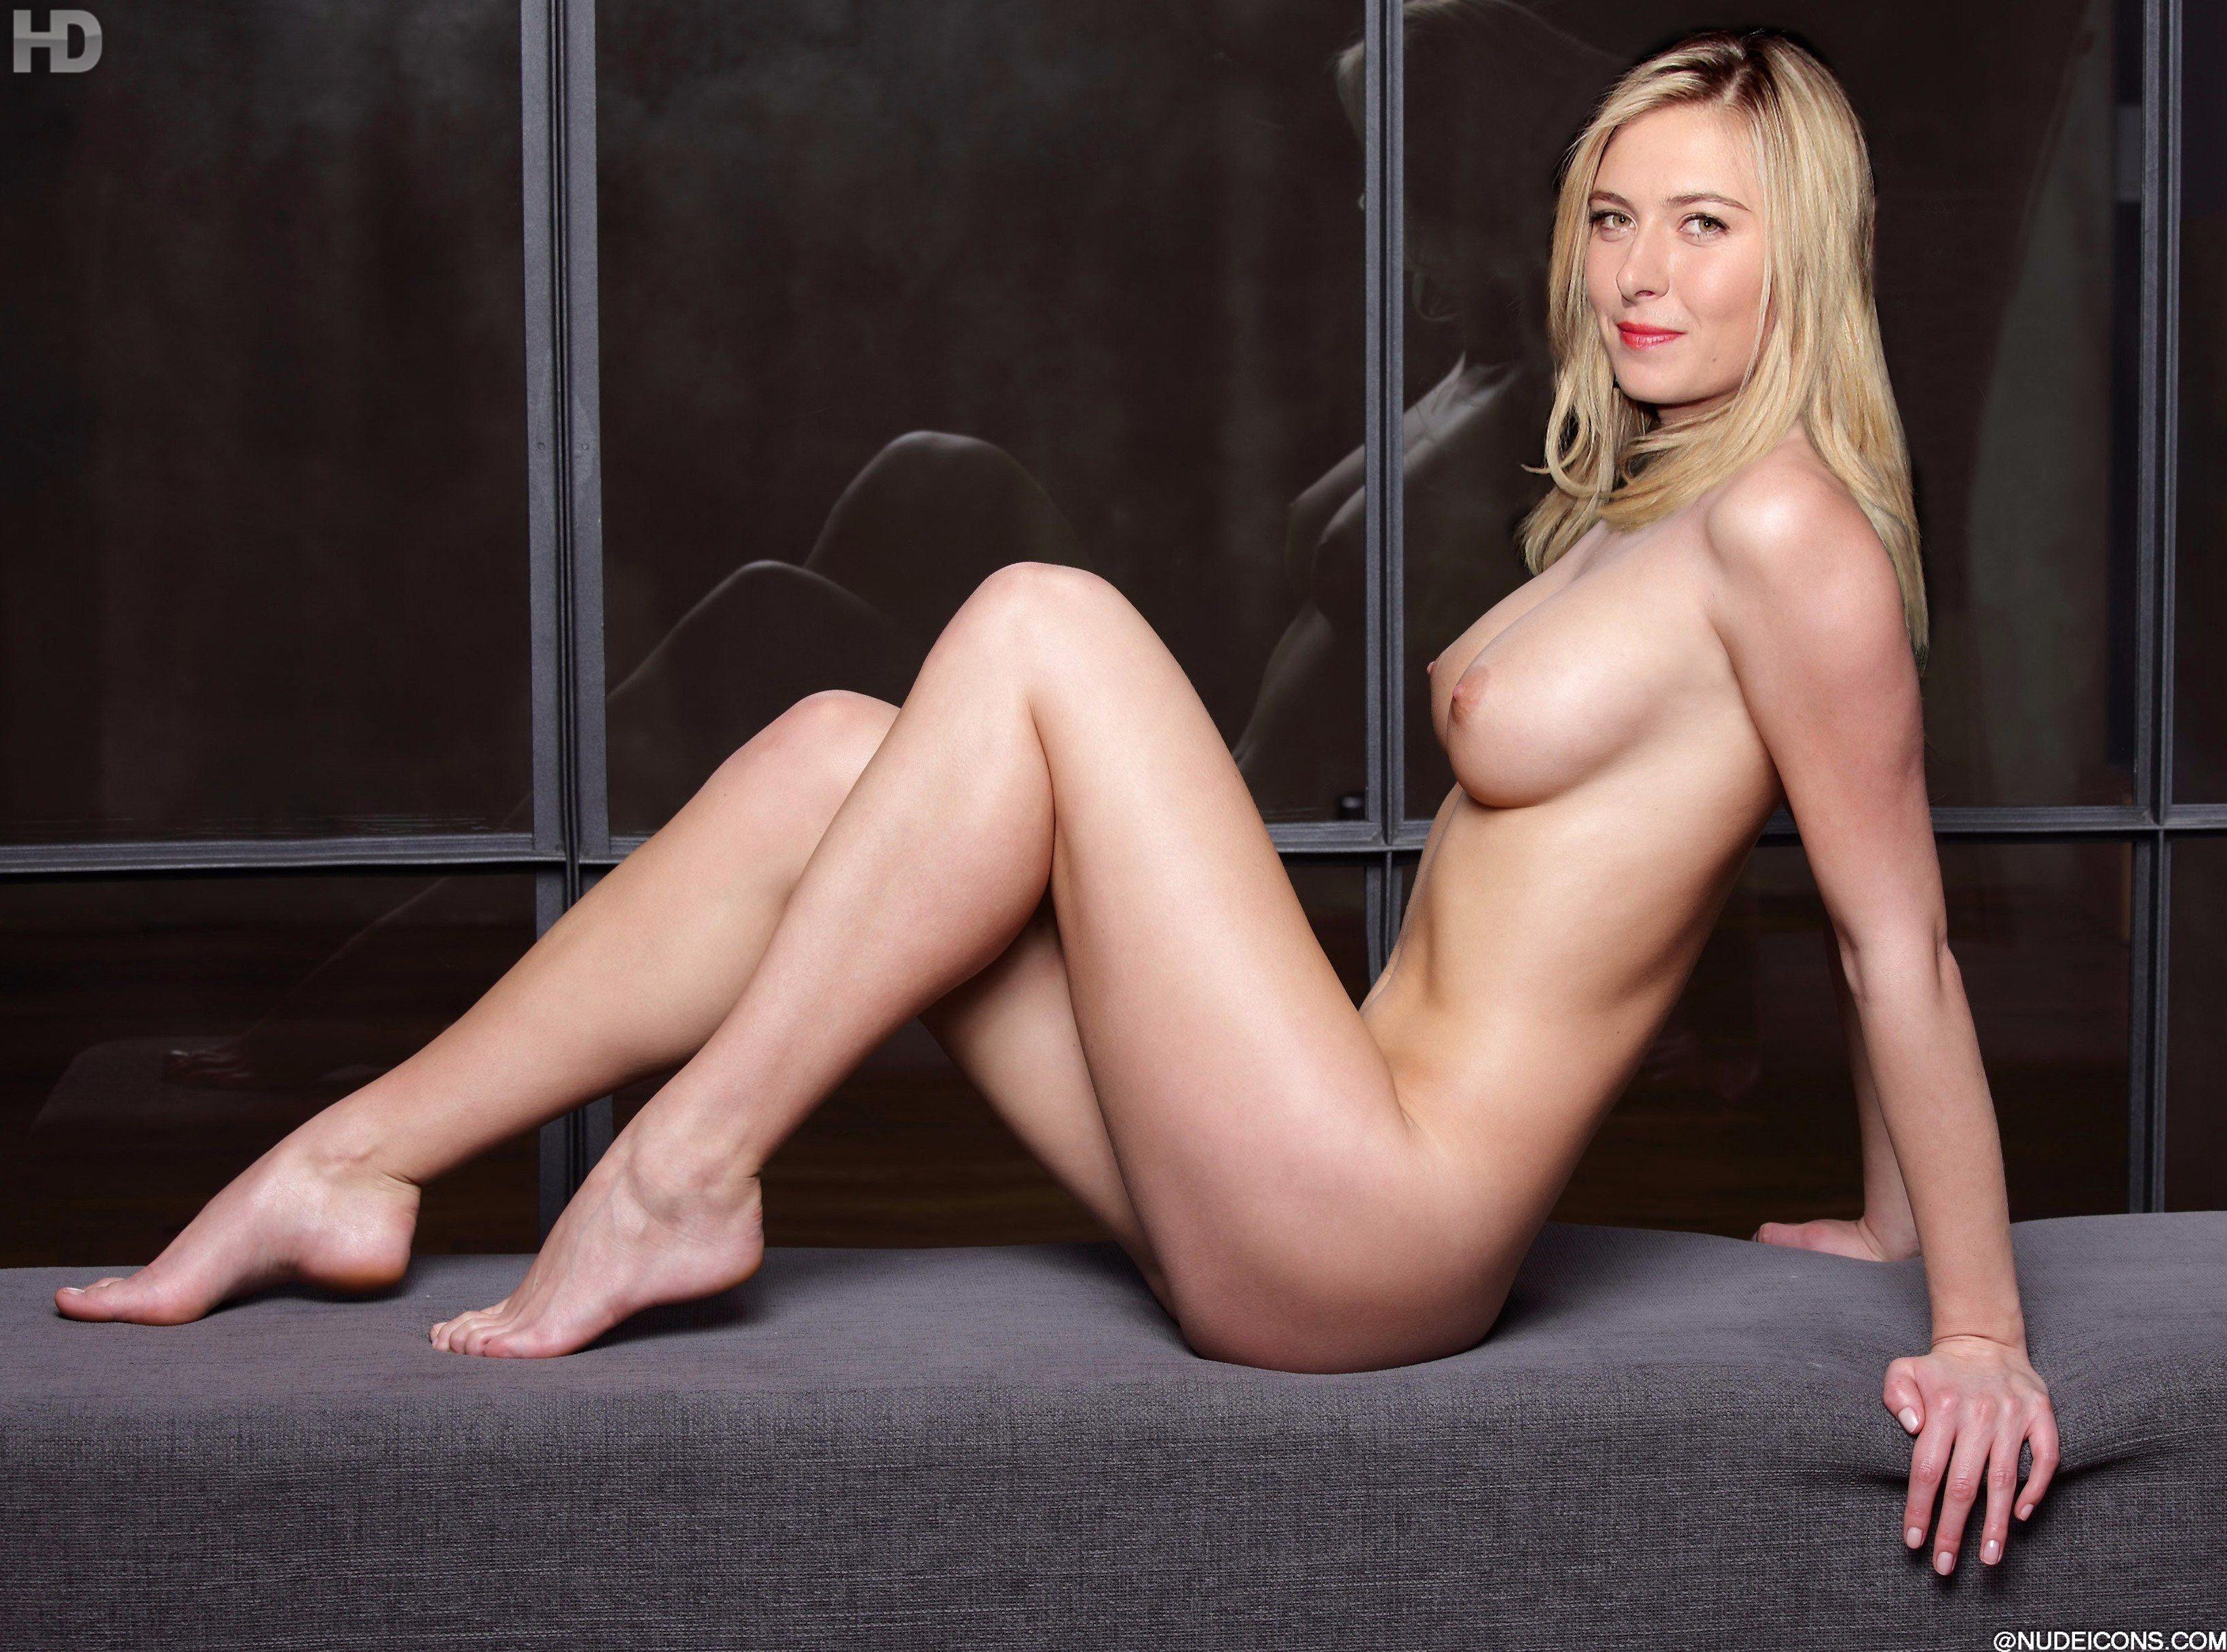 Maria sharapova naked images